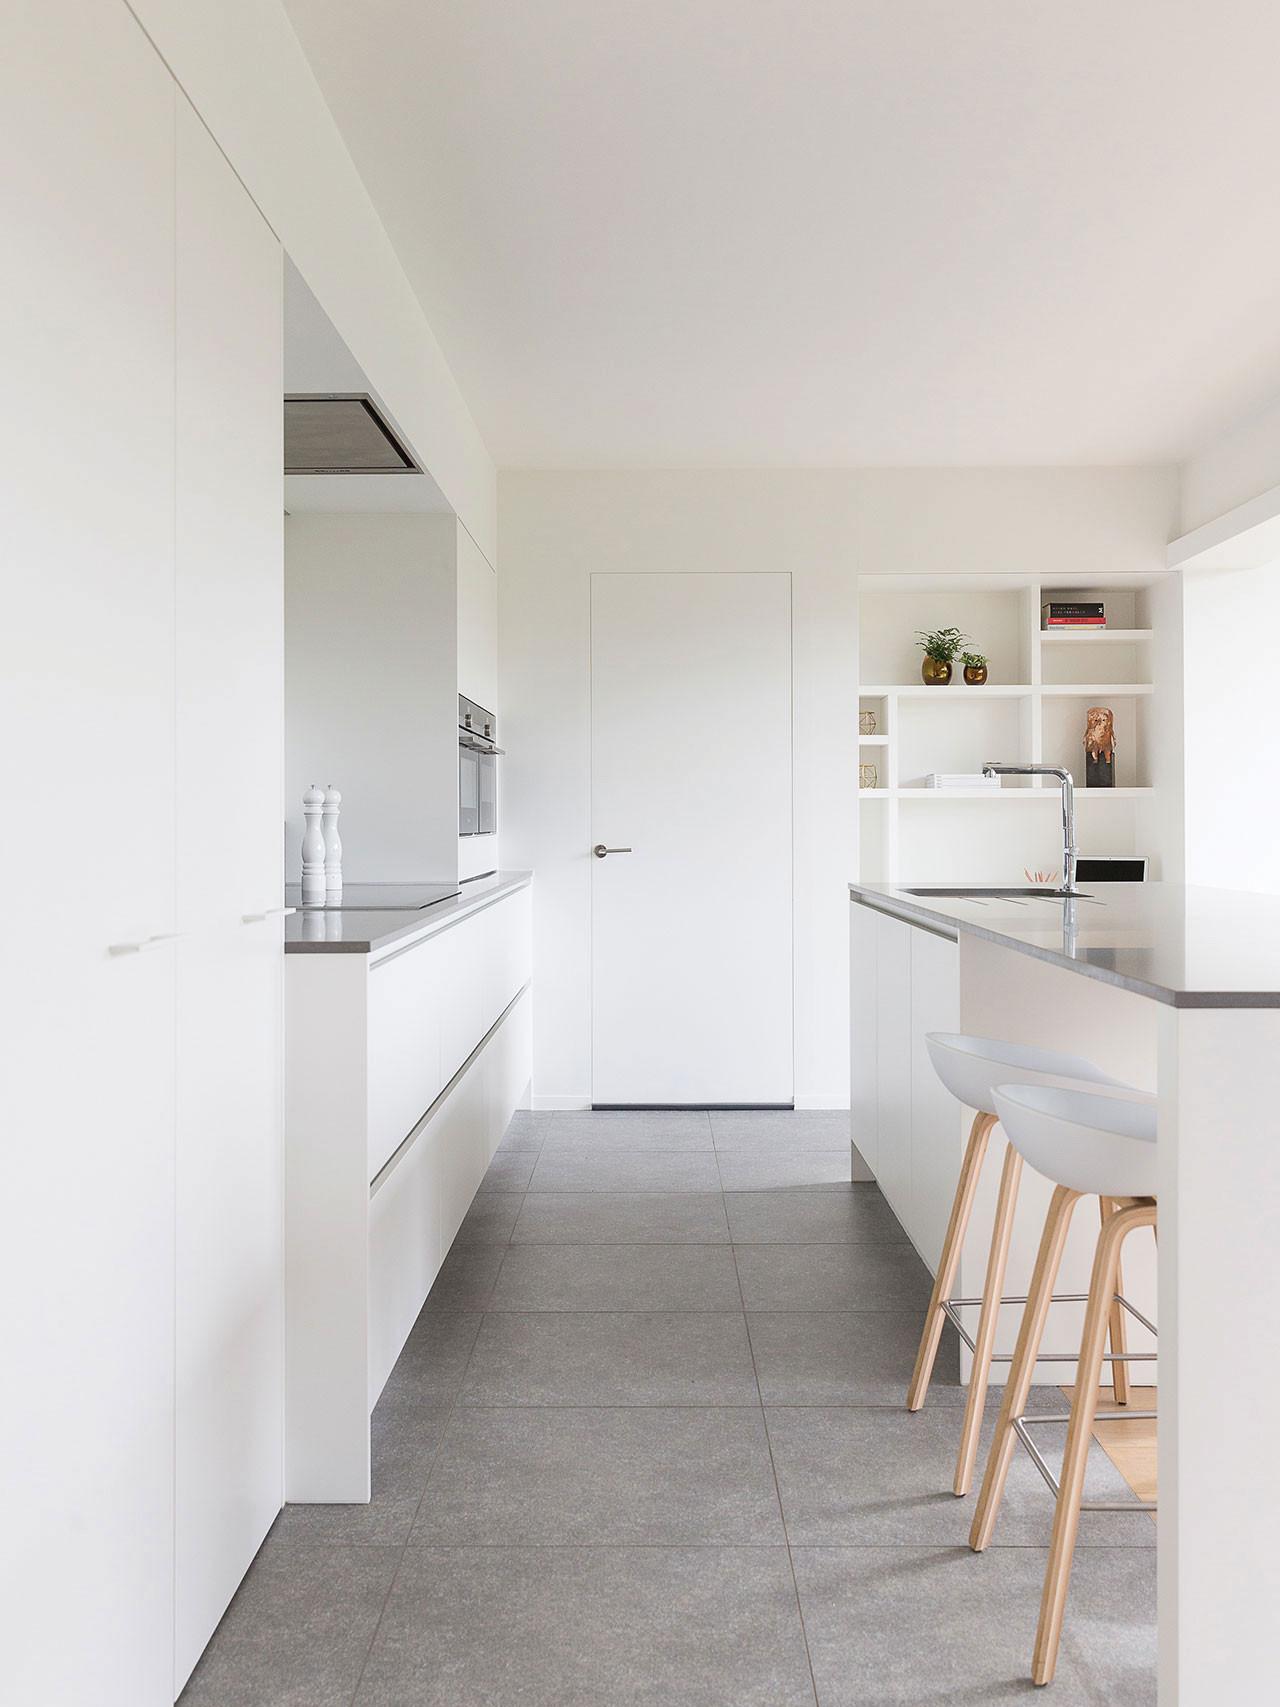 Dekeyzer-hedendaagse-keuken-poederlak-wit-composiet-4.jpg